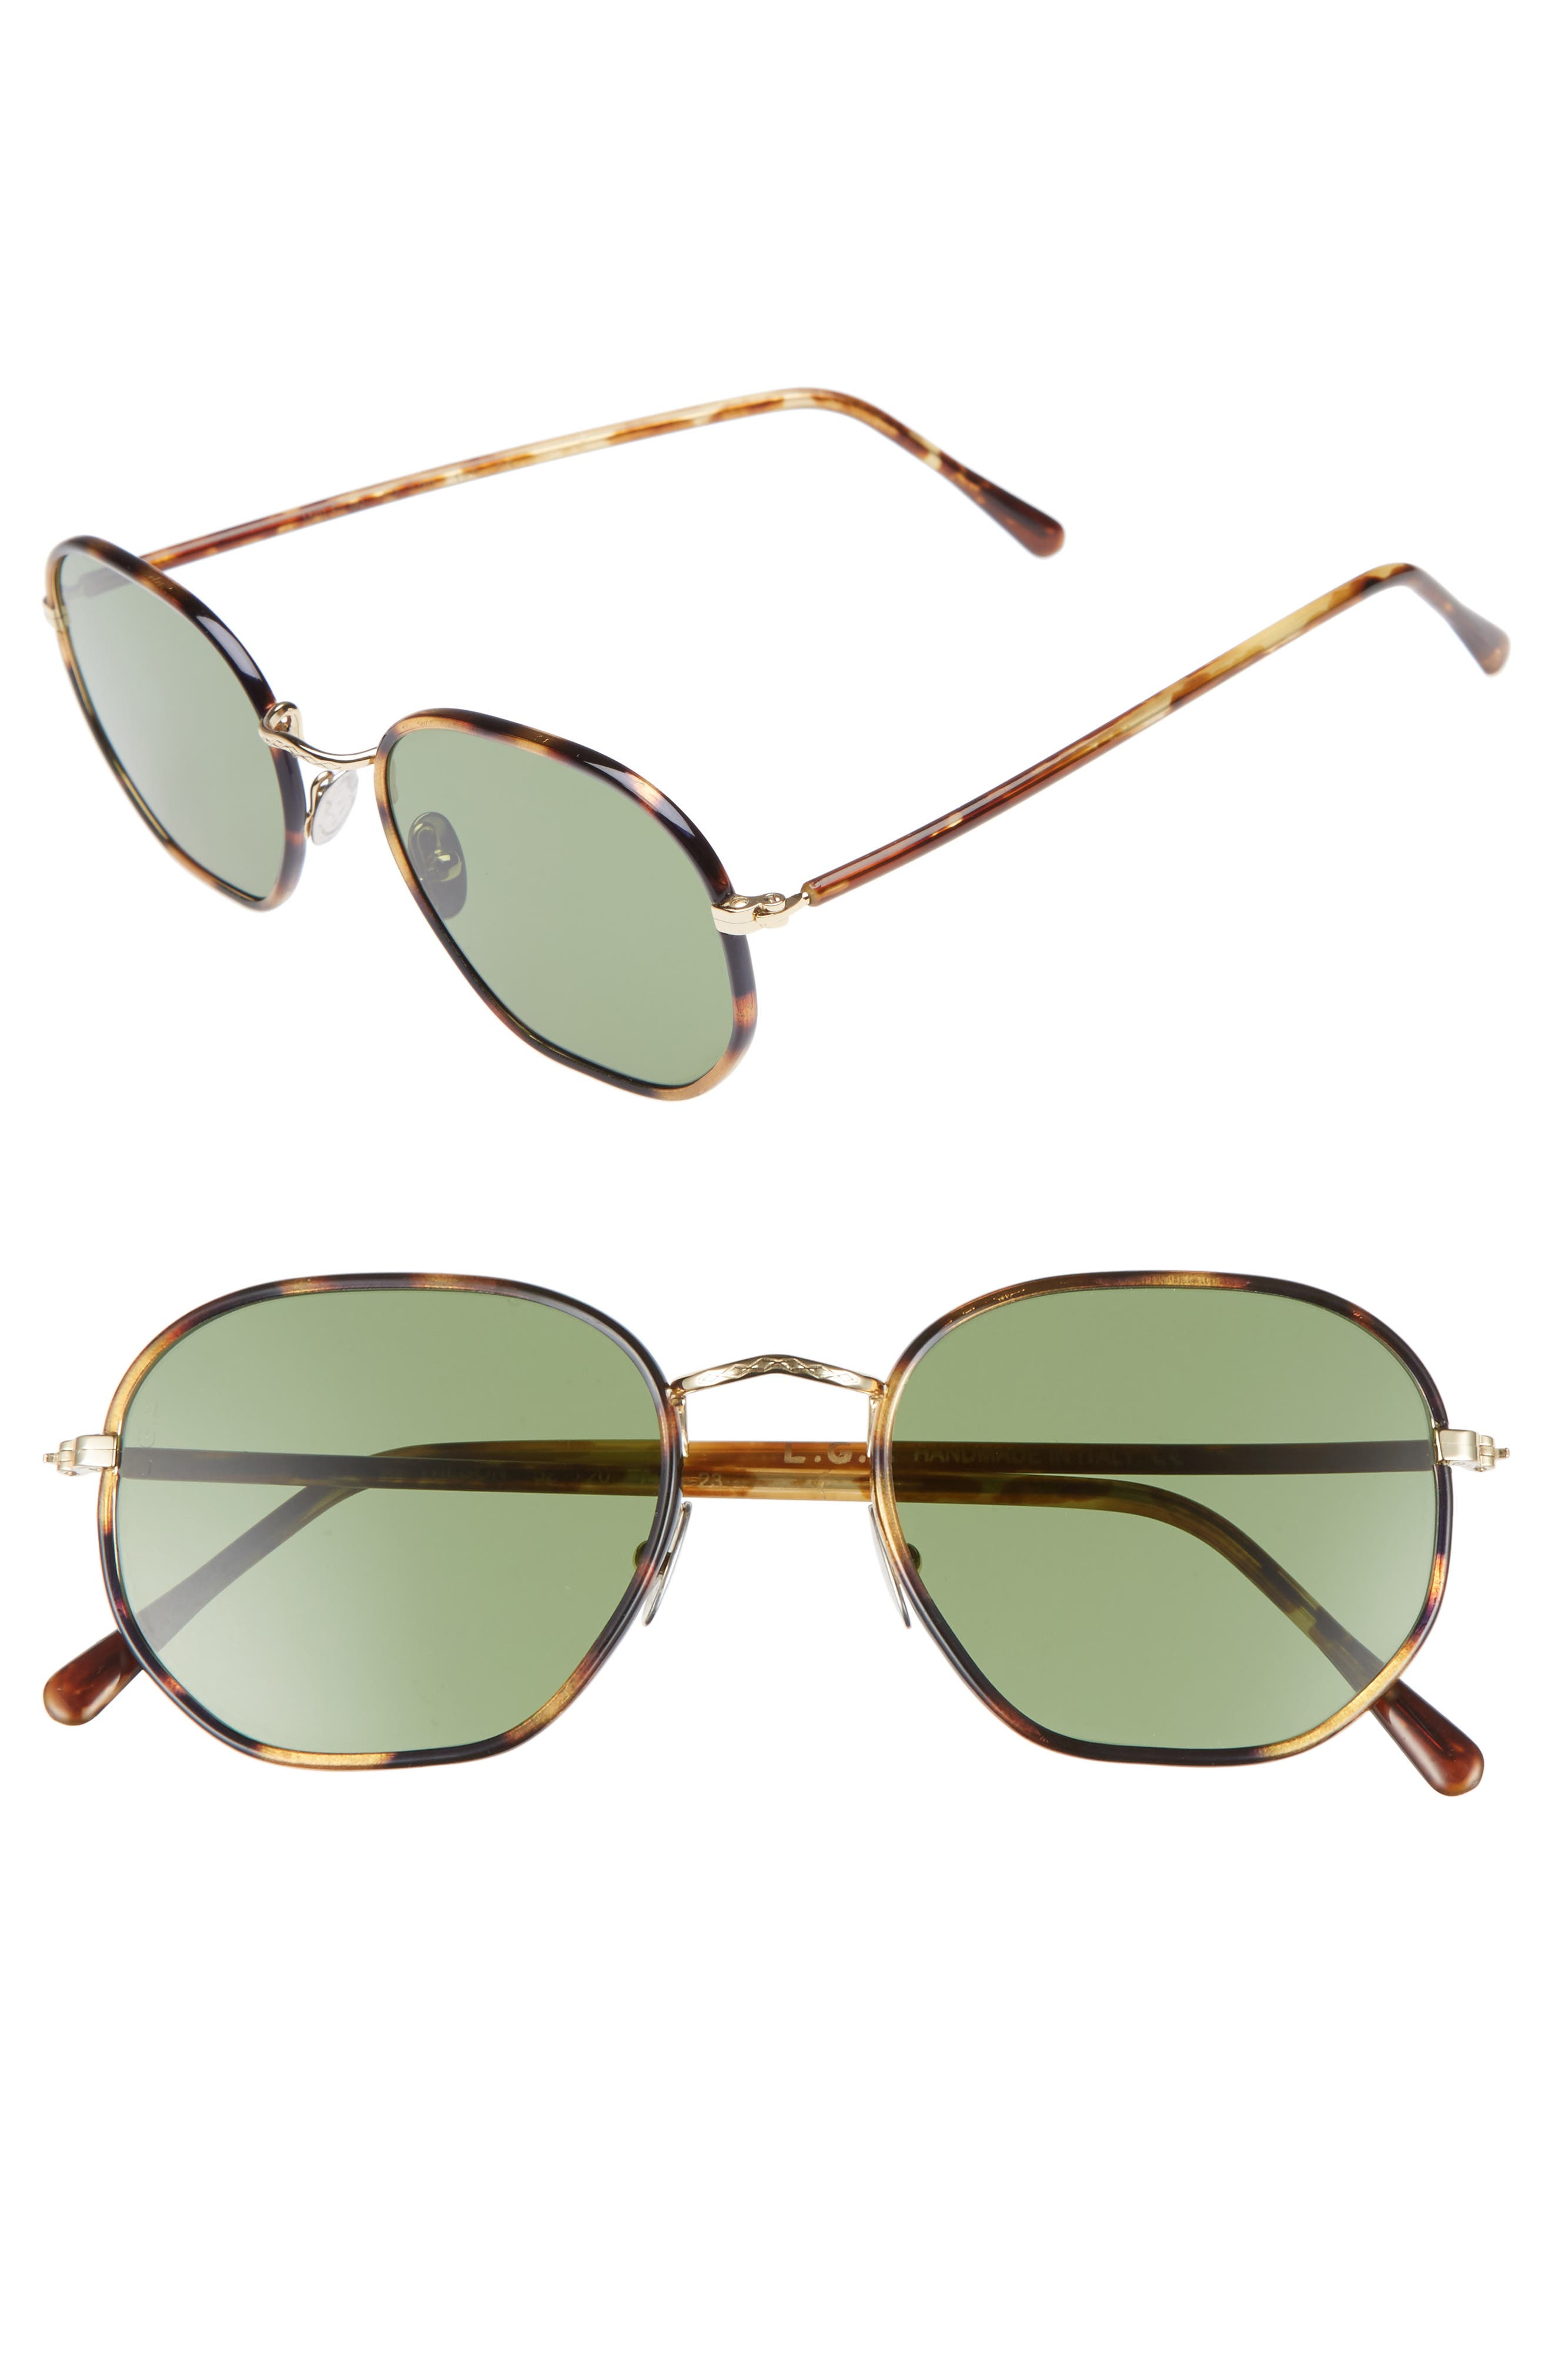 Wilson 52mm Sunglasses,                             Main thumbnail 1, color,                             Havana Tartarugato/ Green